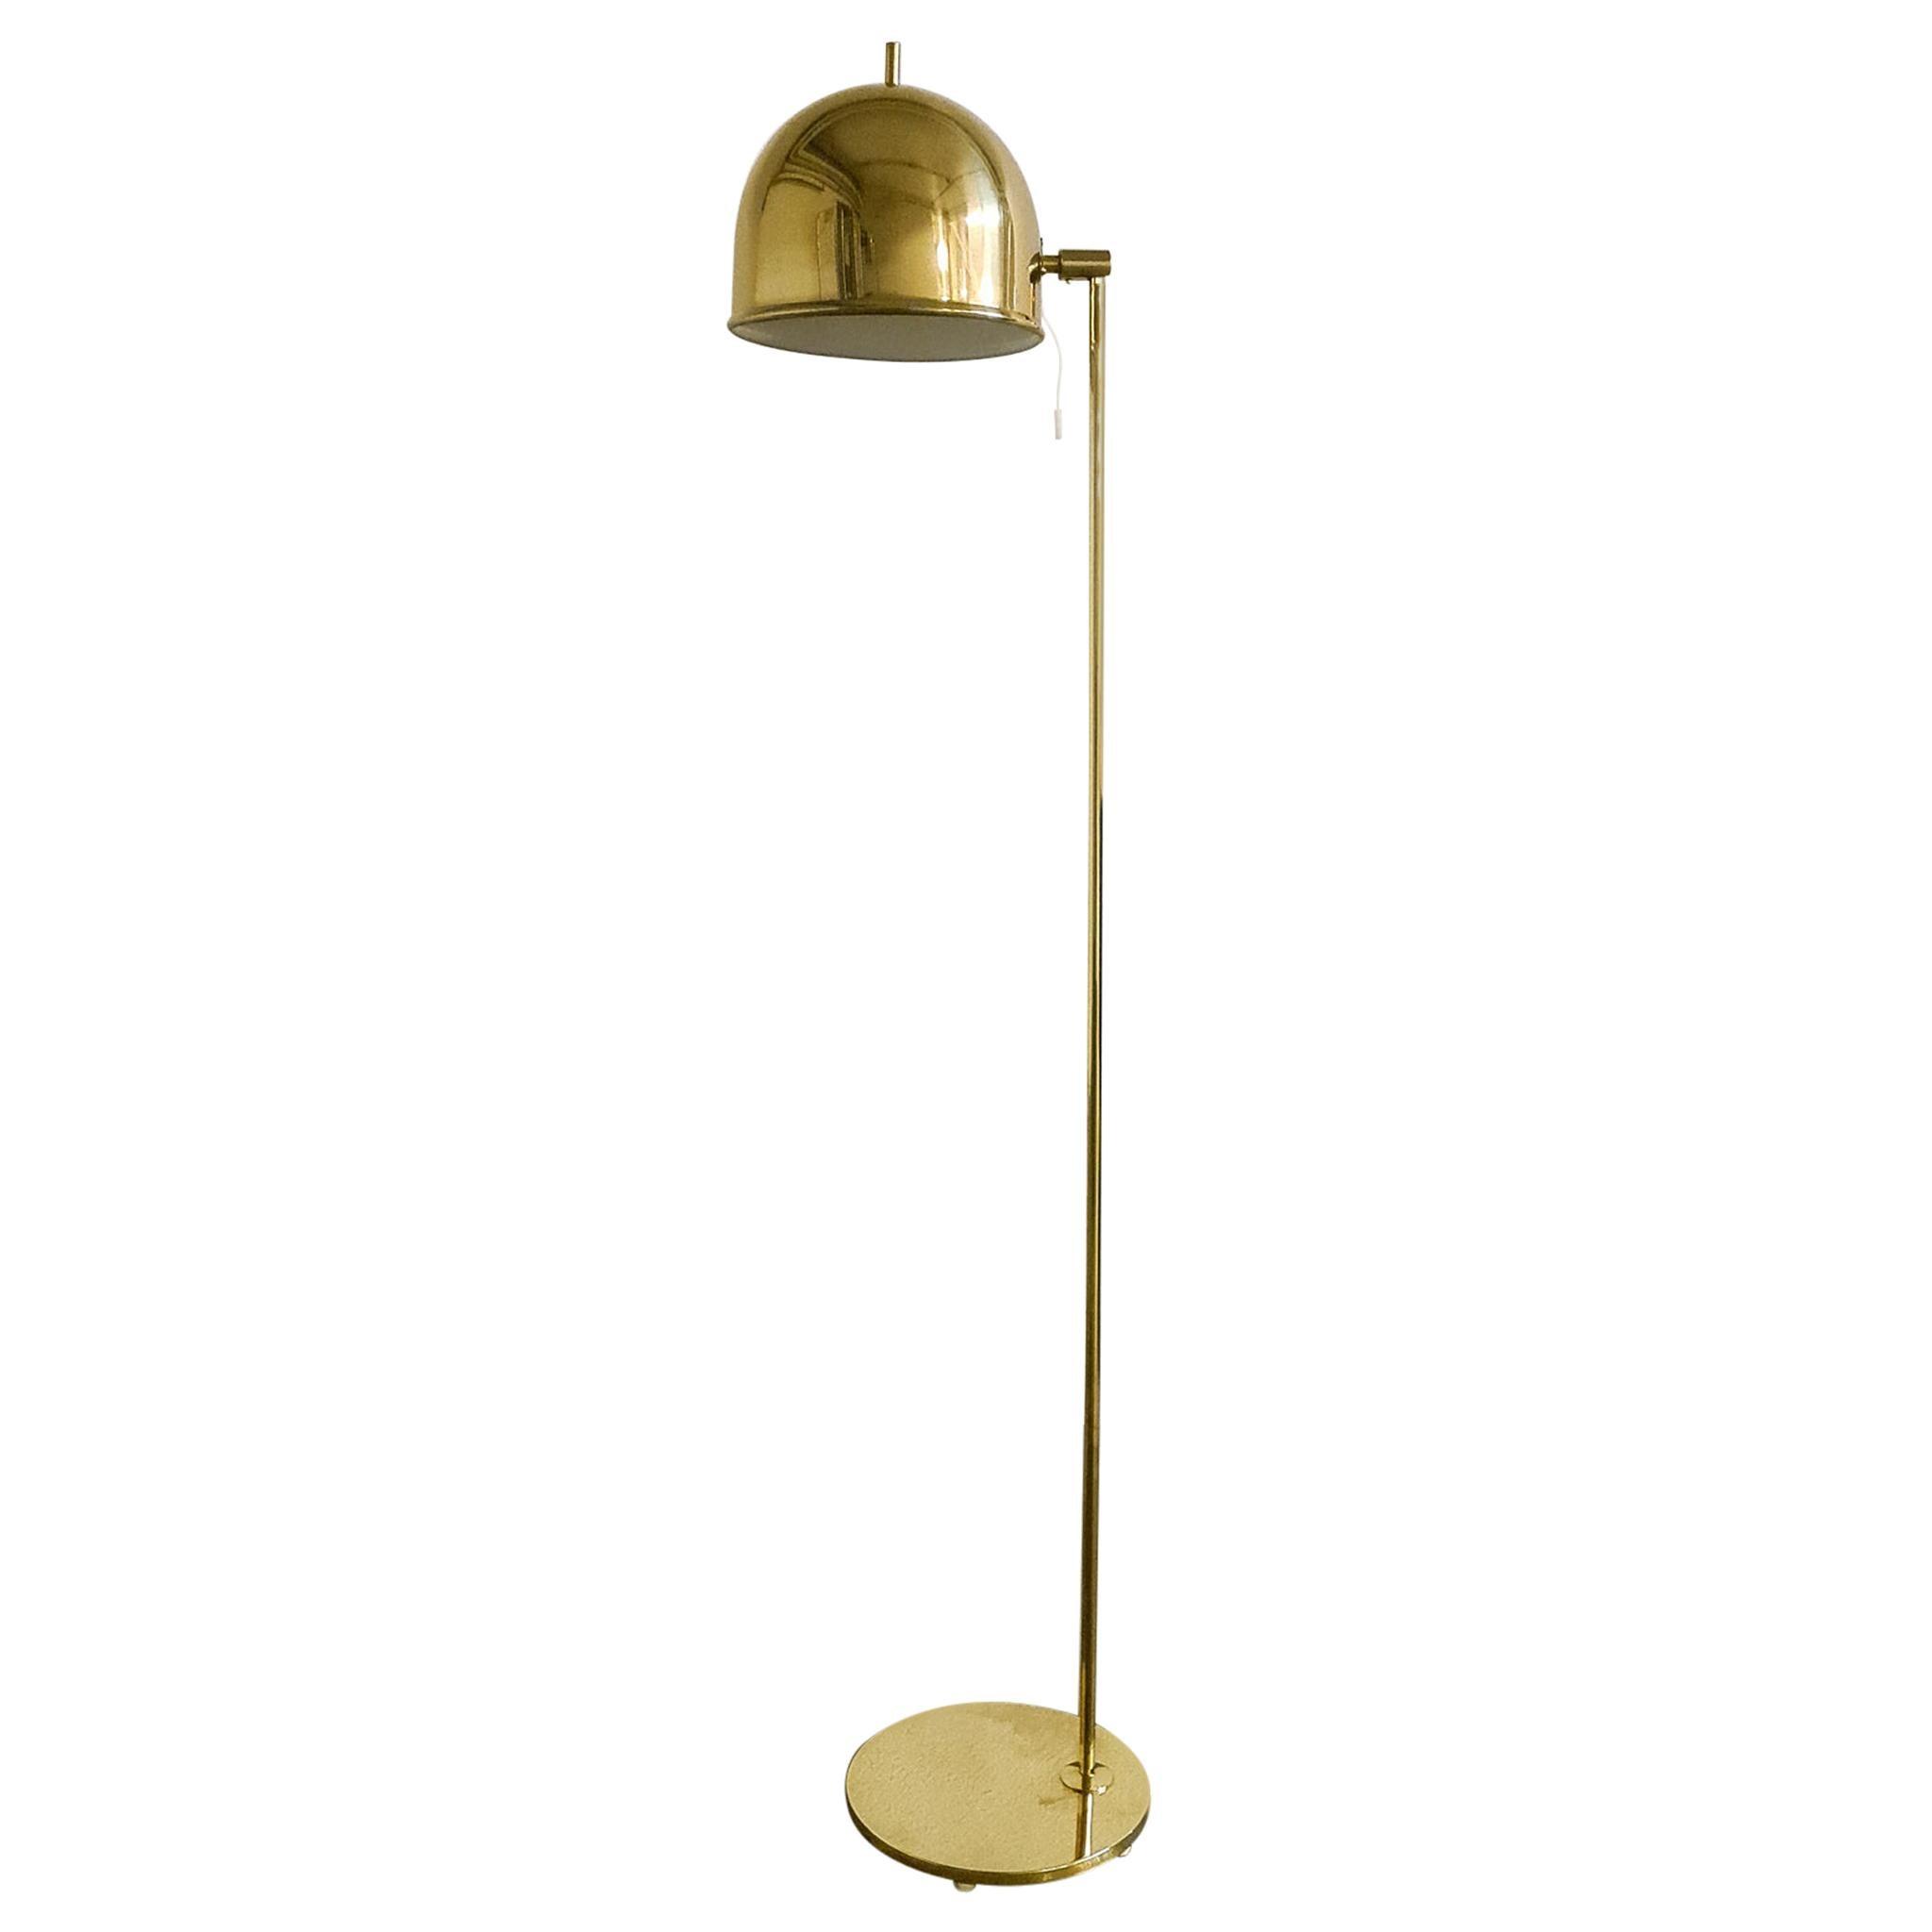 Midcentury Brass Floor Lamp, Model G-075, Bergboms, Sweden, 1960s